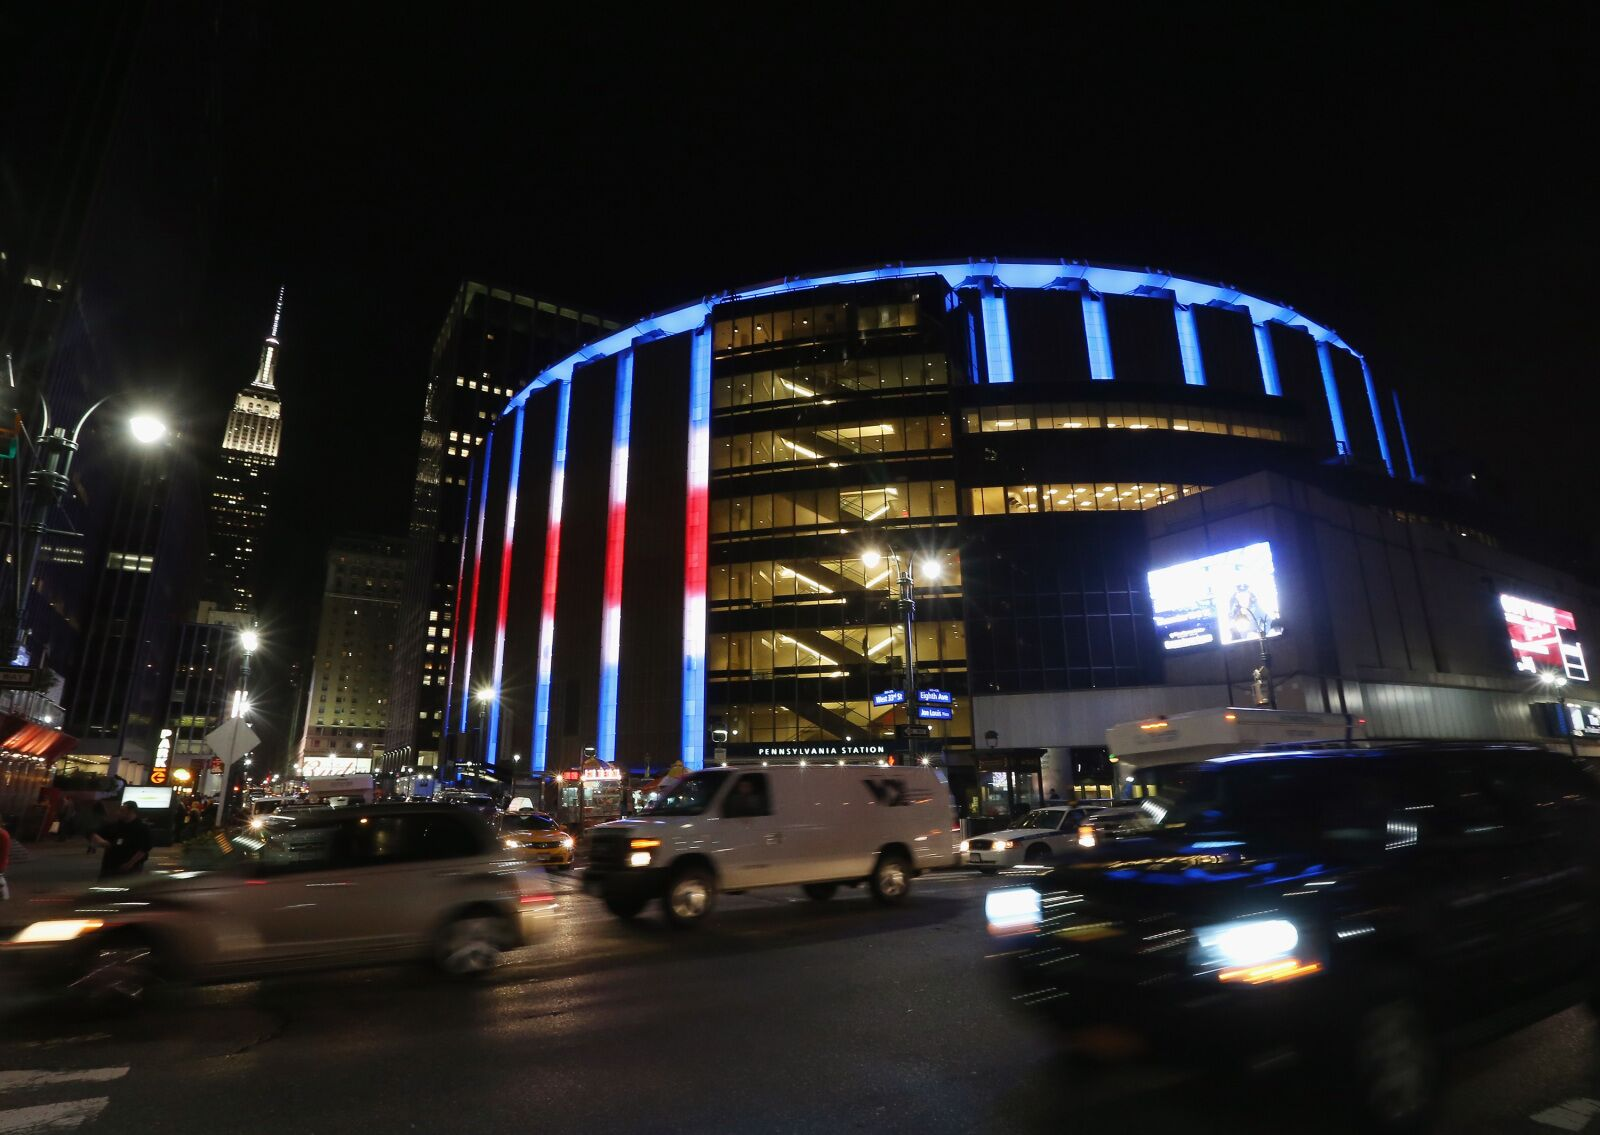 New York Rangers: Remembering their reaction to September 11